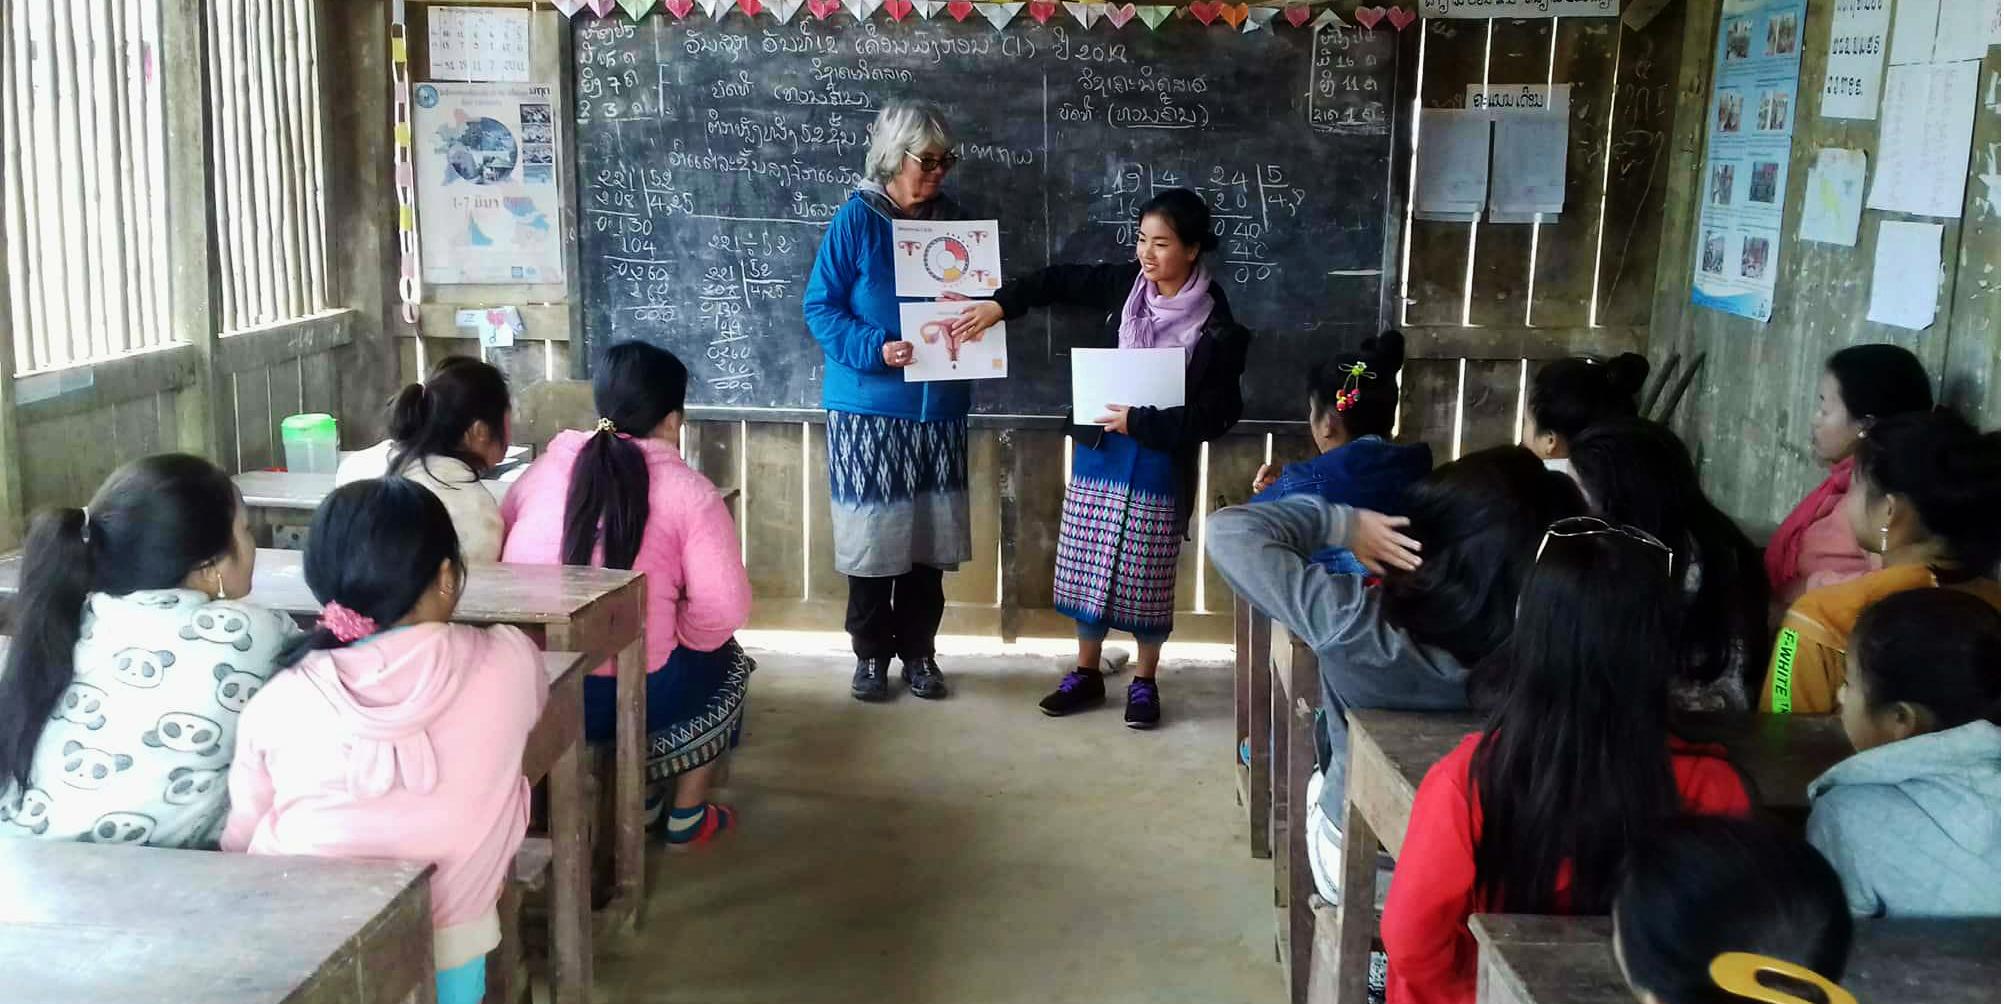 volunteer leading women's health classes on a short-term volunteering program